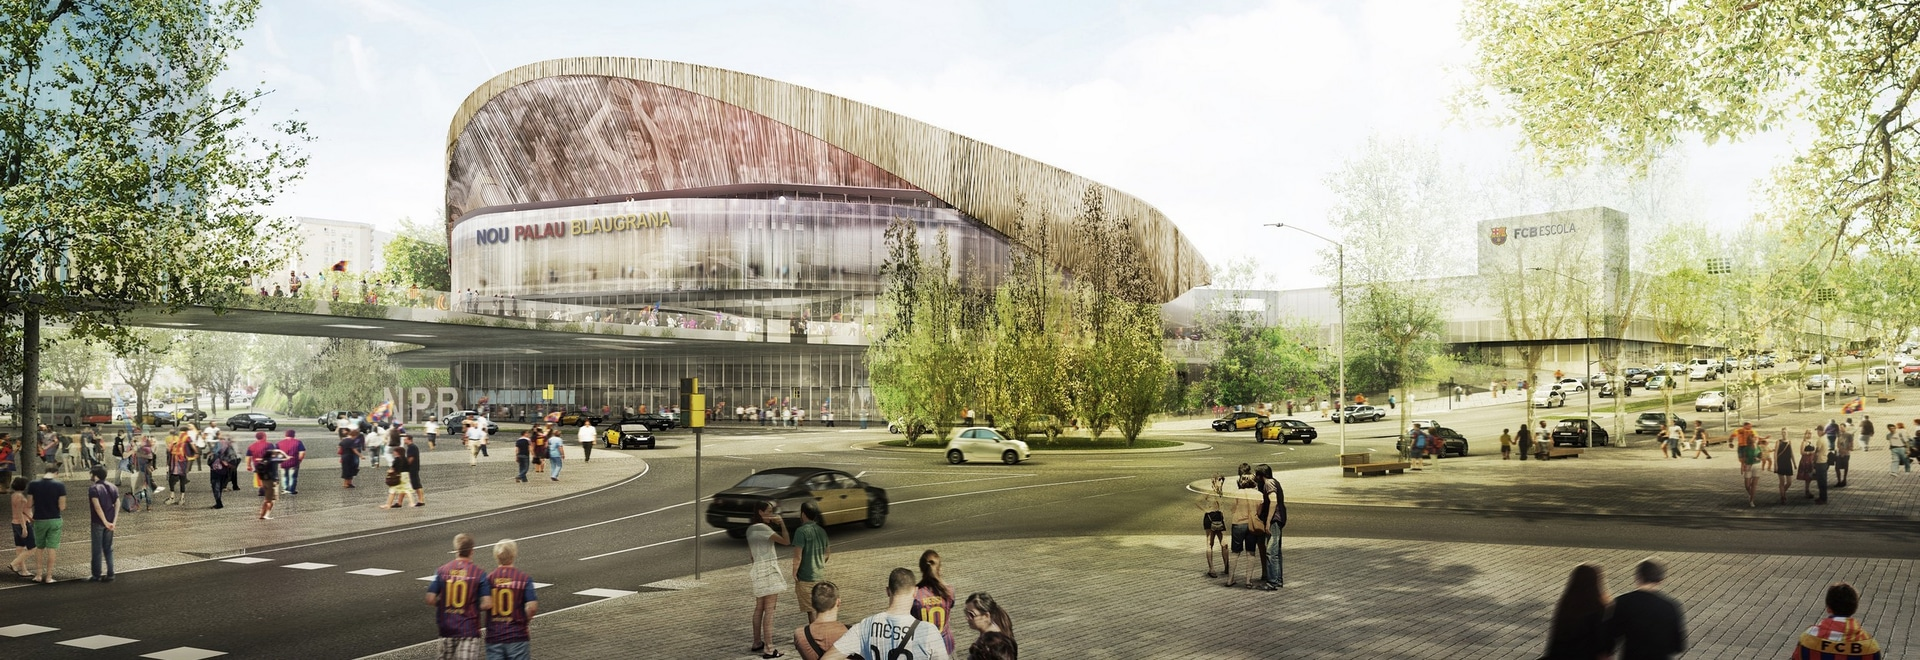 New Palau Blaugrana Arena